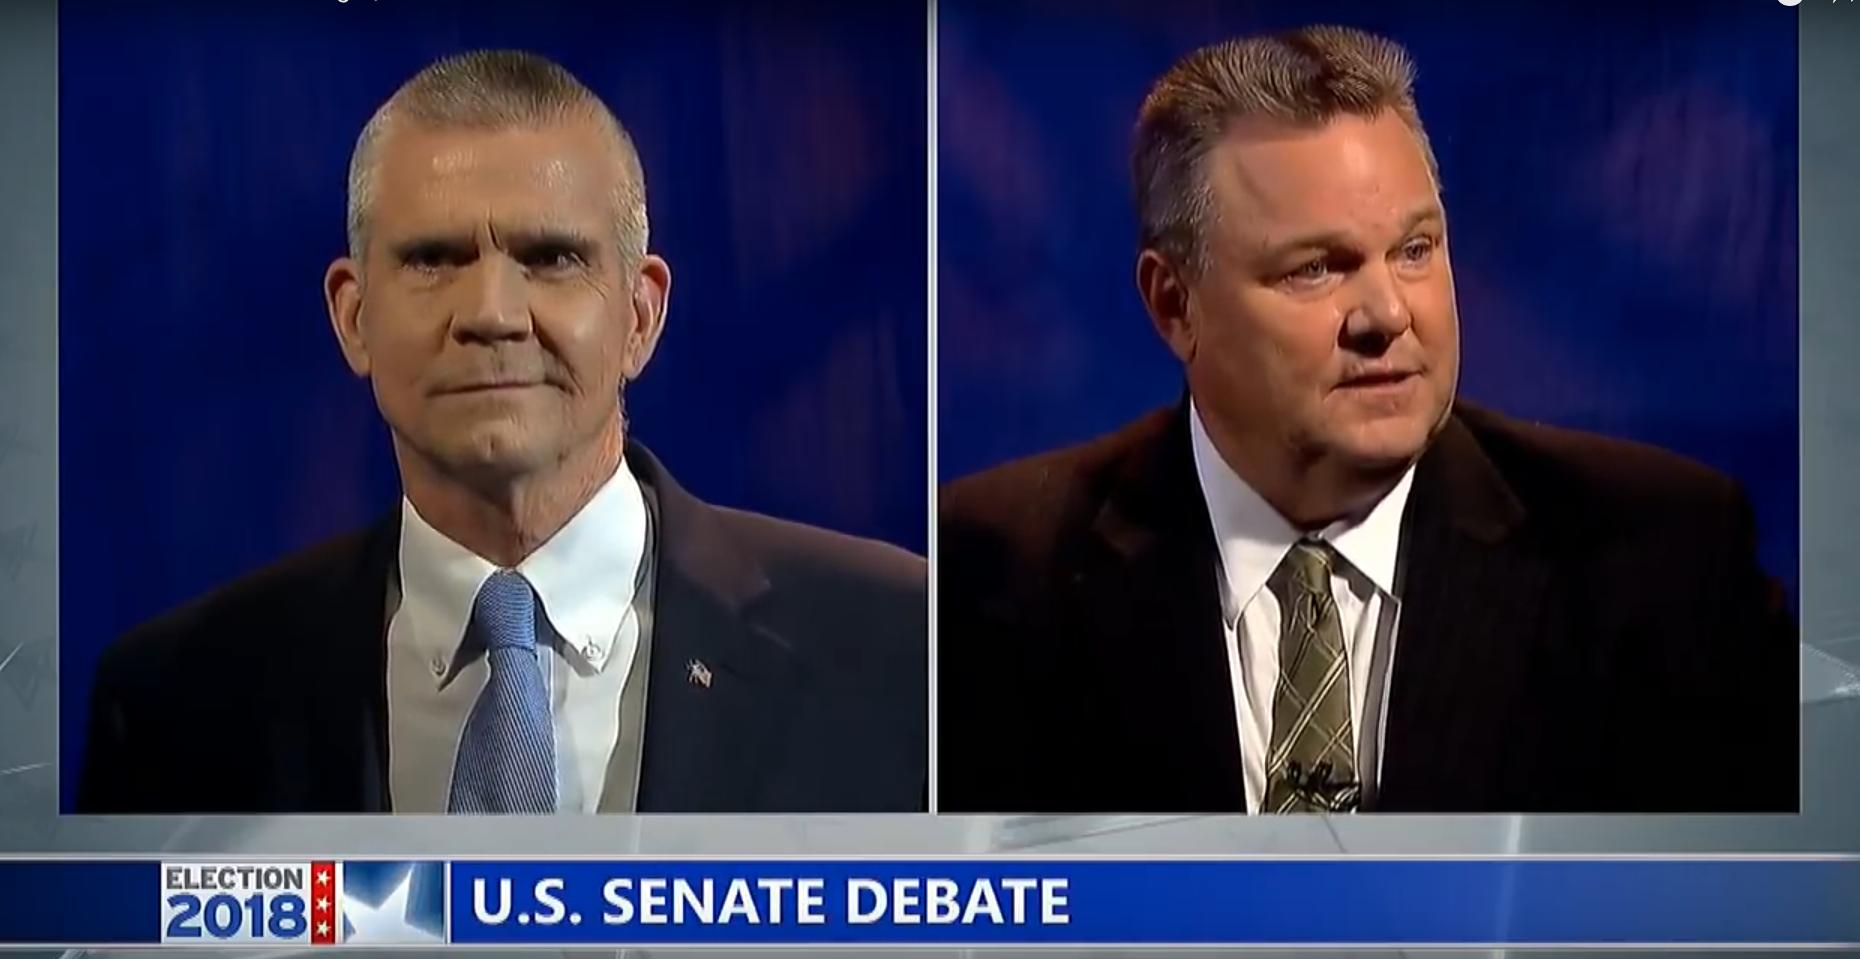 Debate Night | U.S. Senate